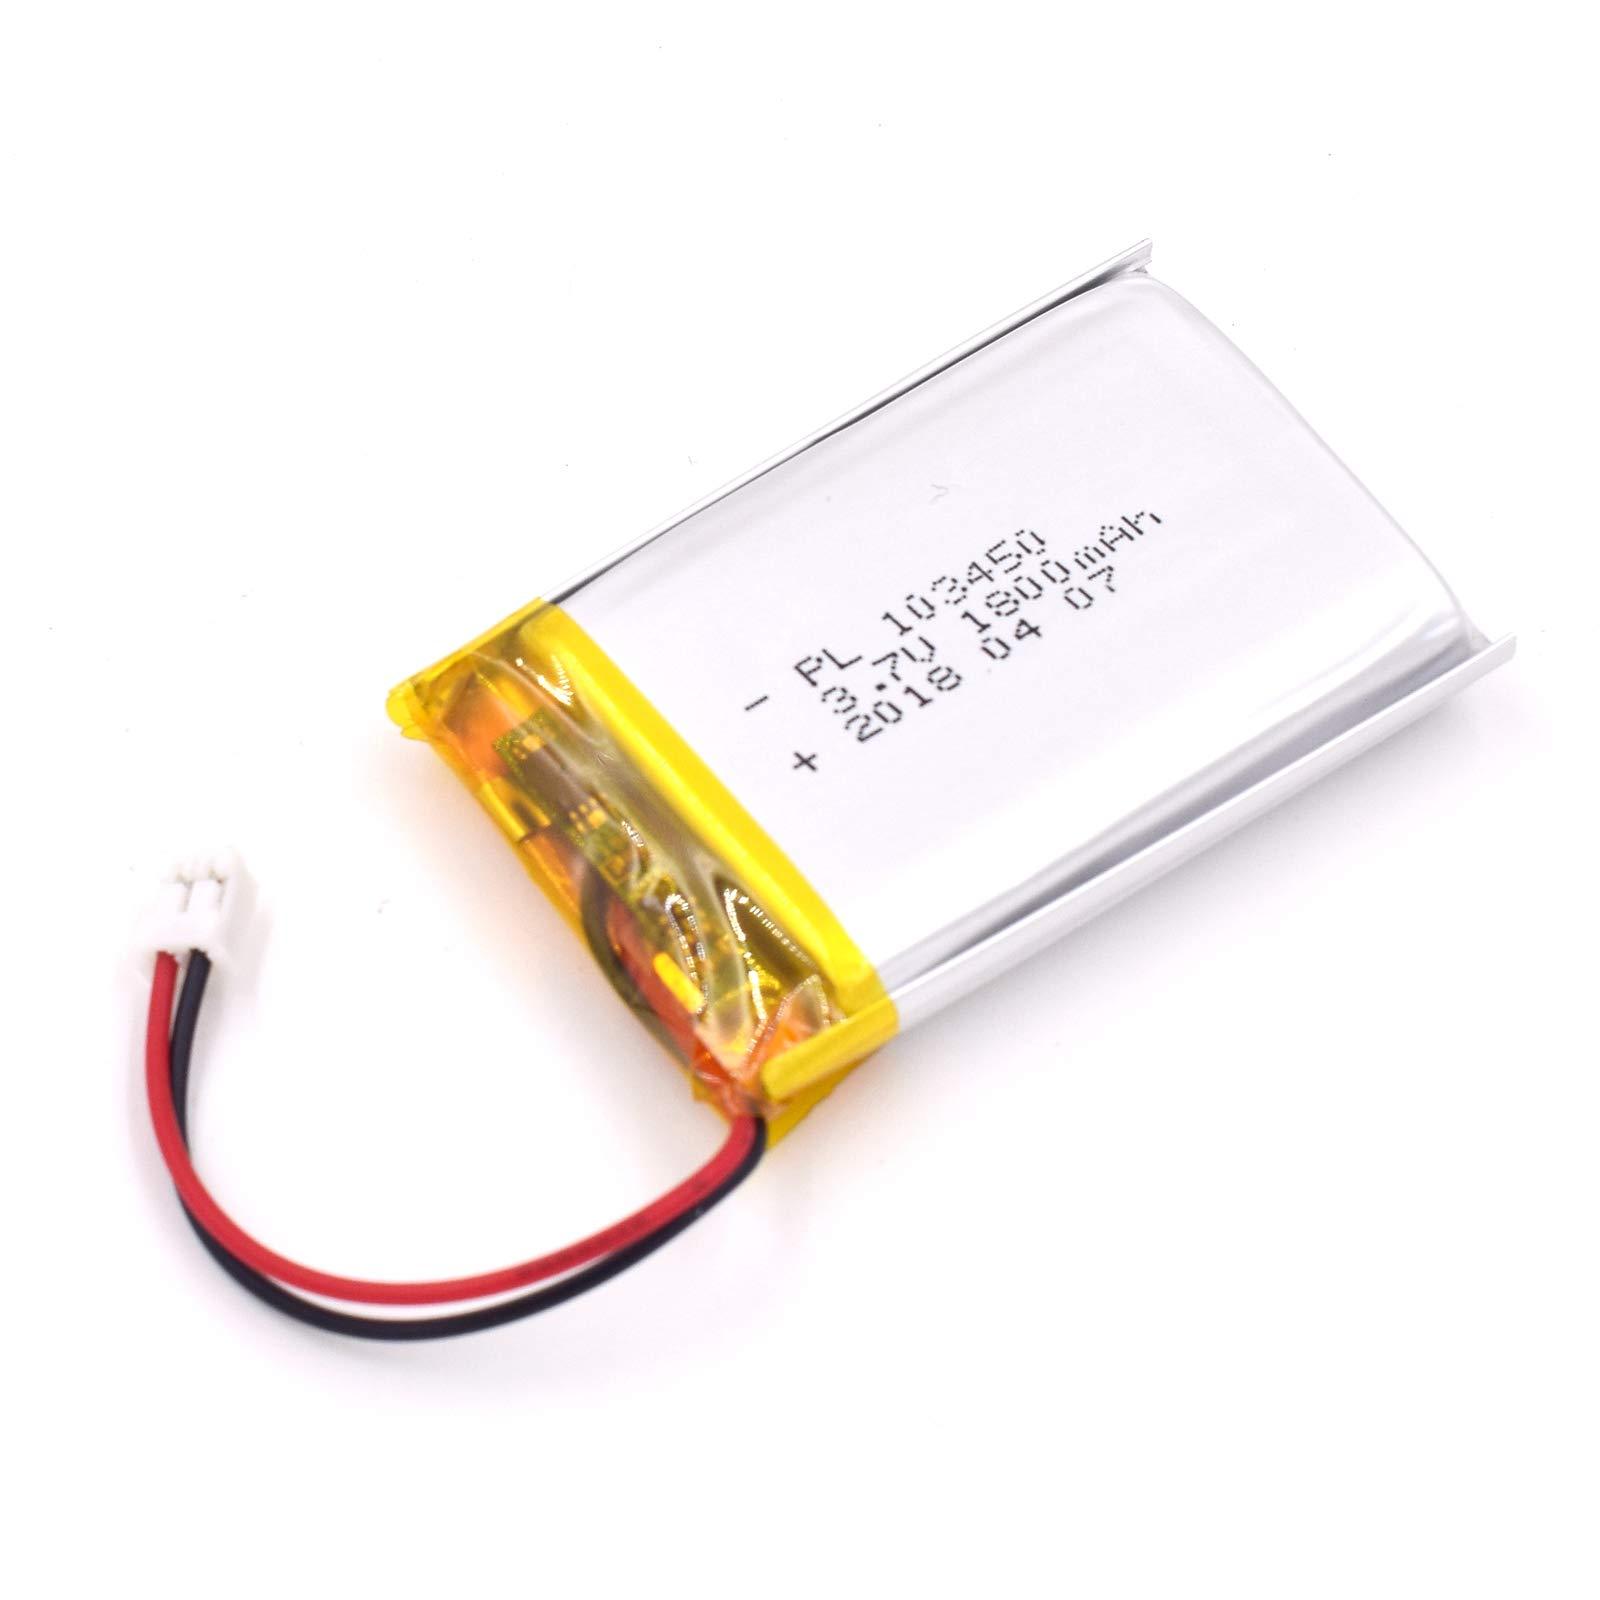 Bateria Lipo 3.7V 1800mAh 103450 Recargable JST Conector